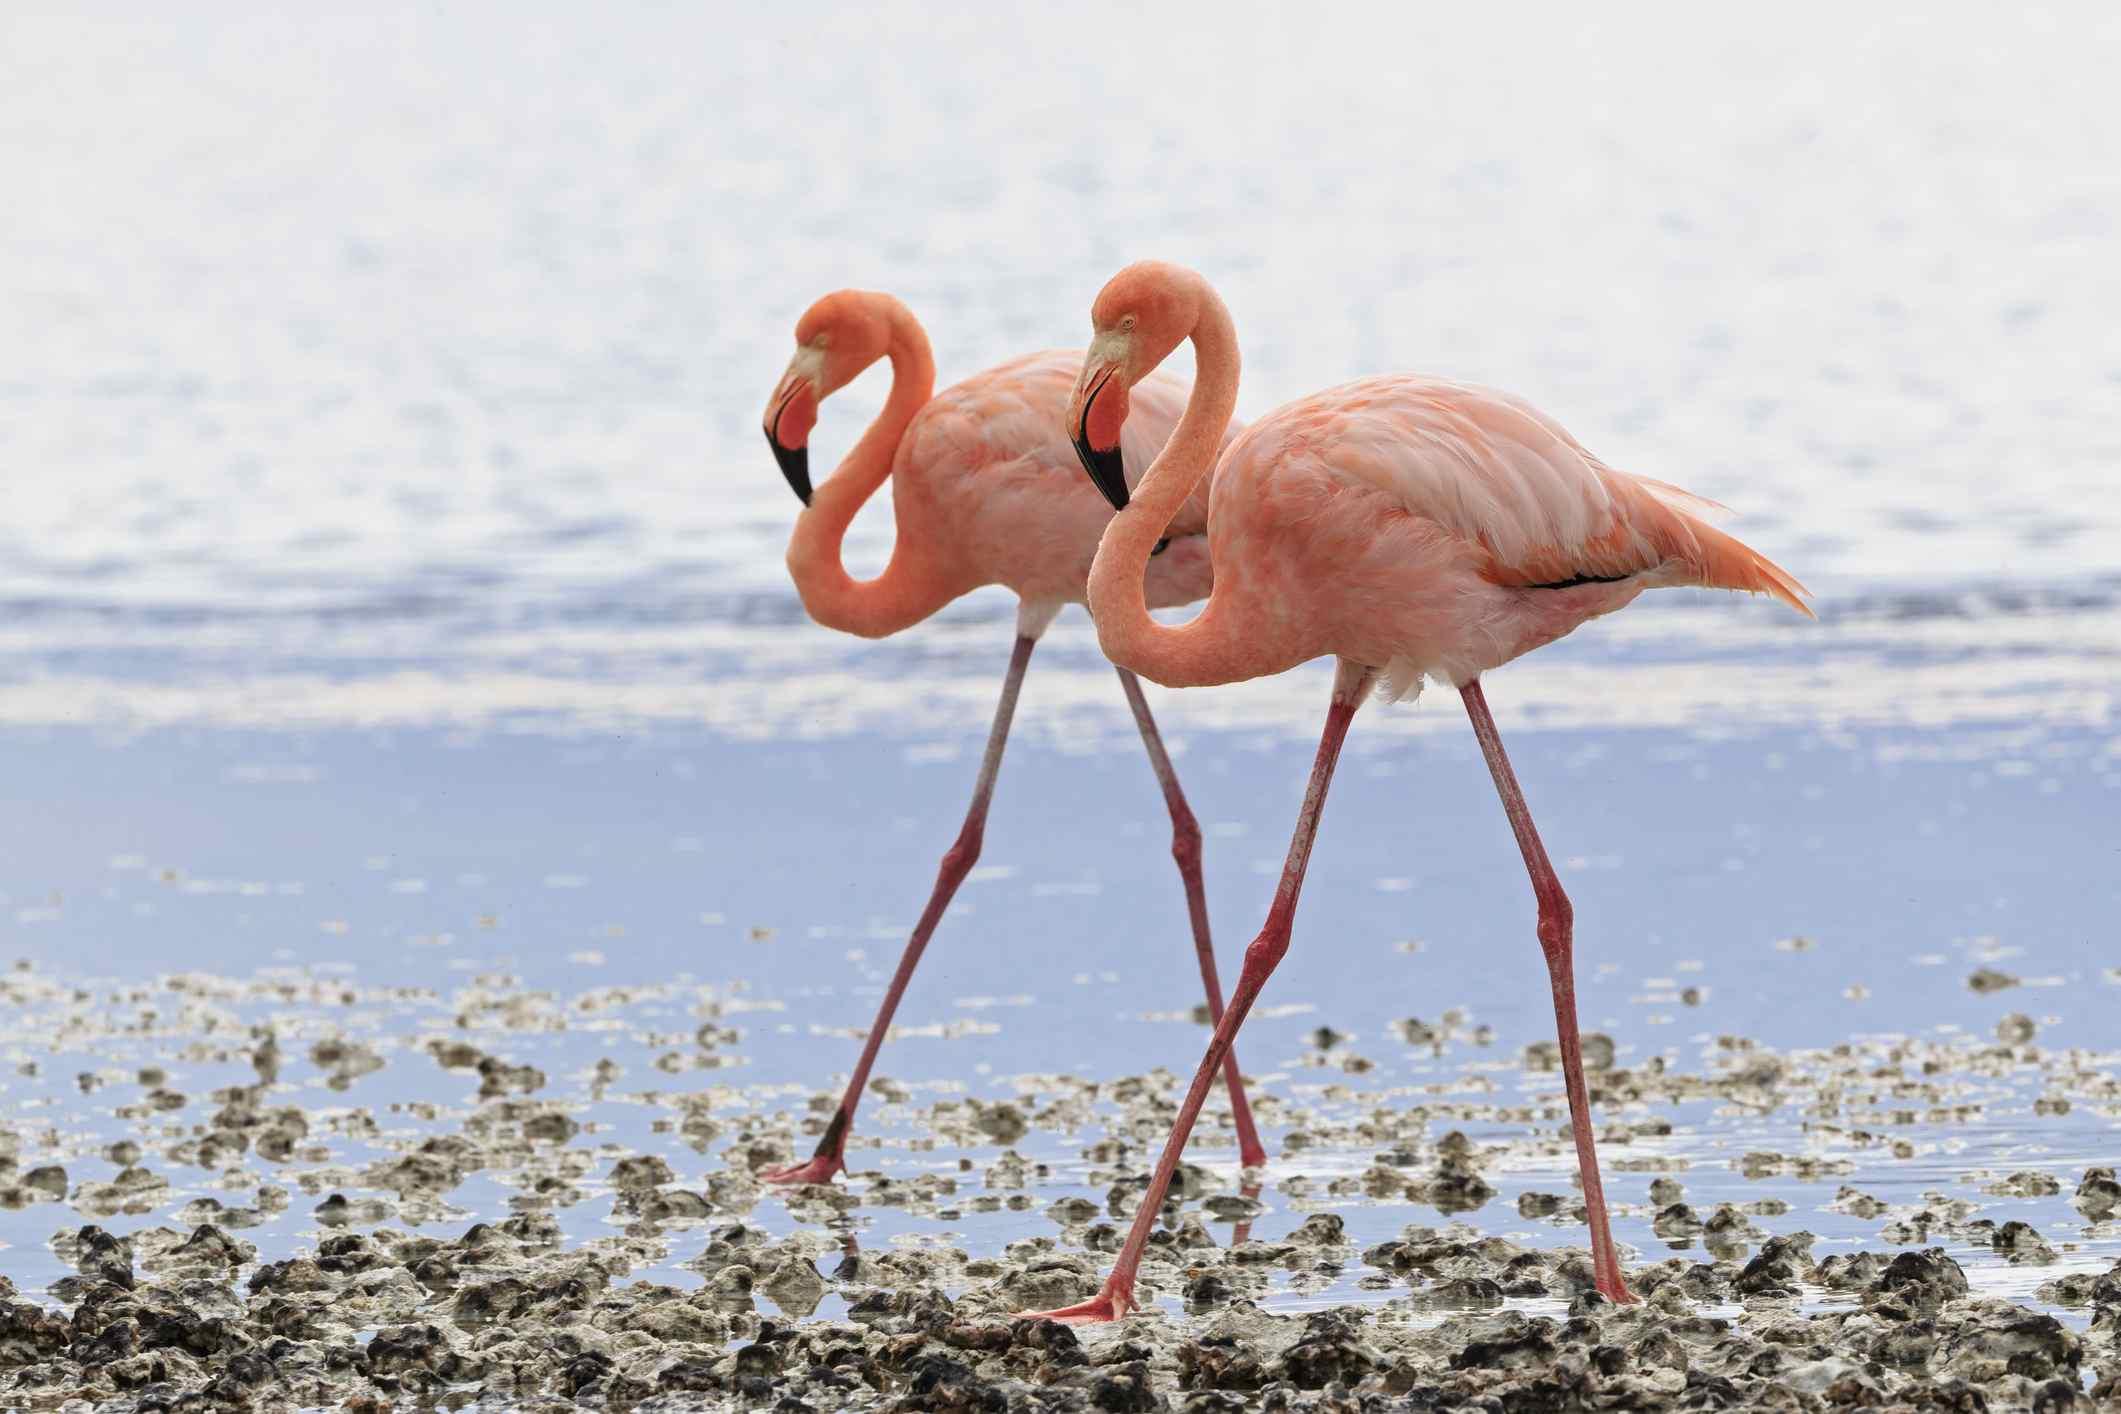 Pink flamingos standing in water